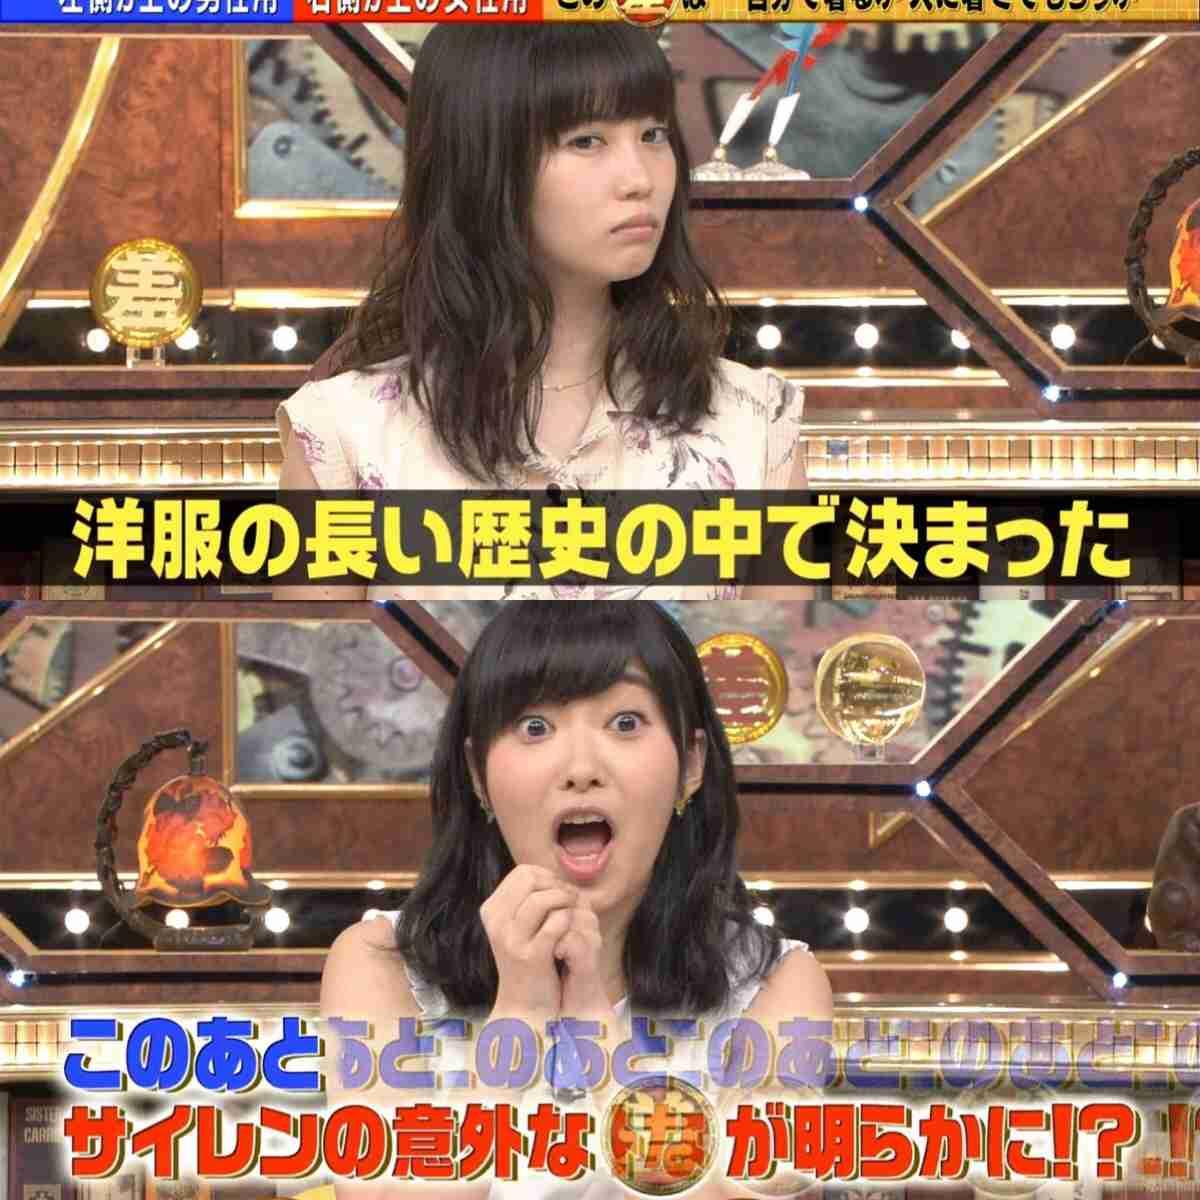 HKT48・指原莉乃と女優・志田未来が実はソックリだった!? ネット上で話題沸騰中